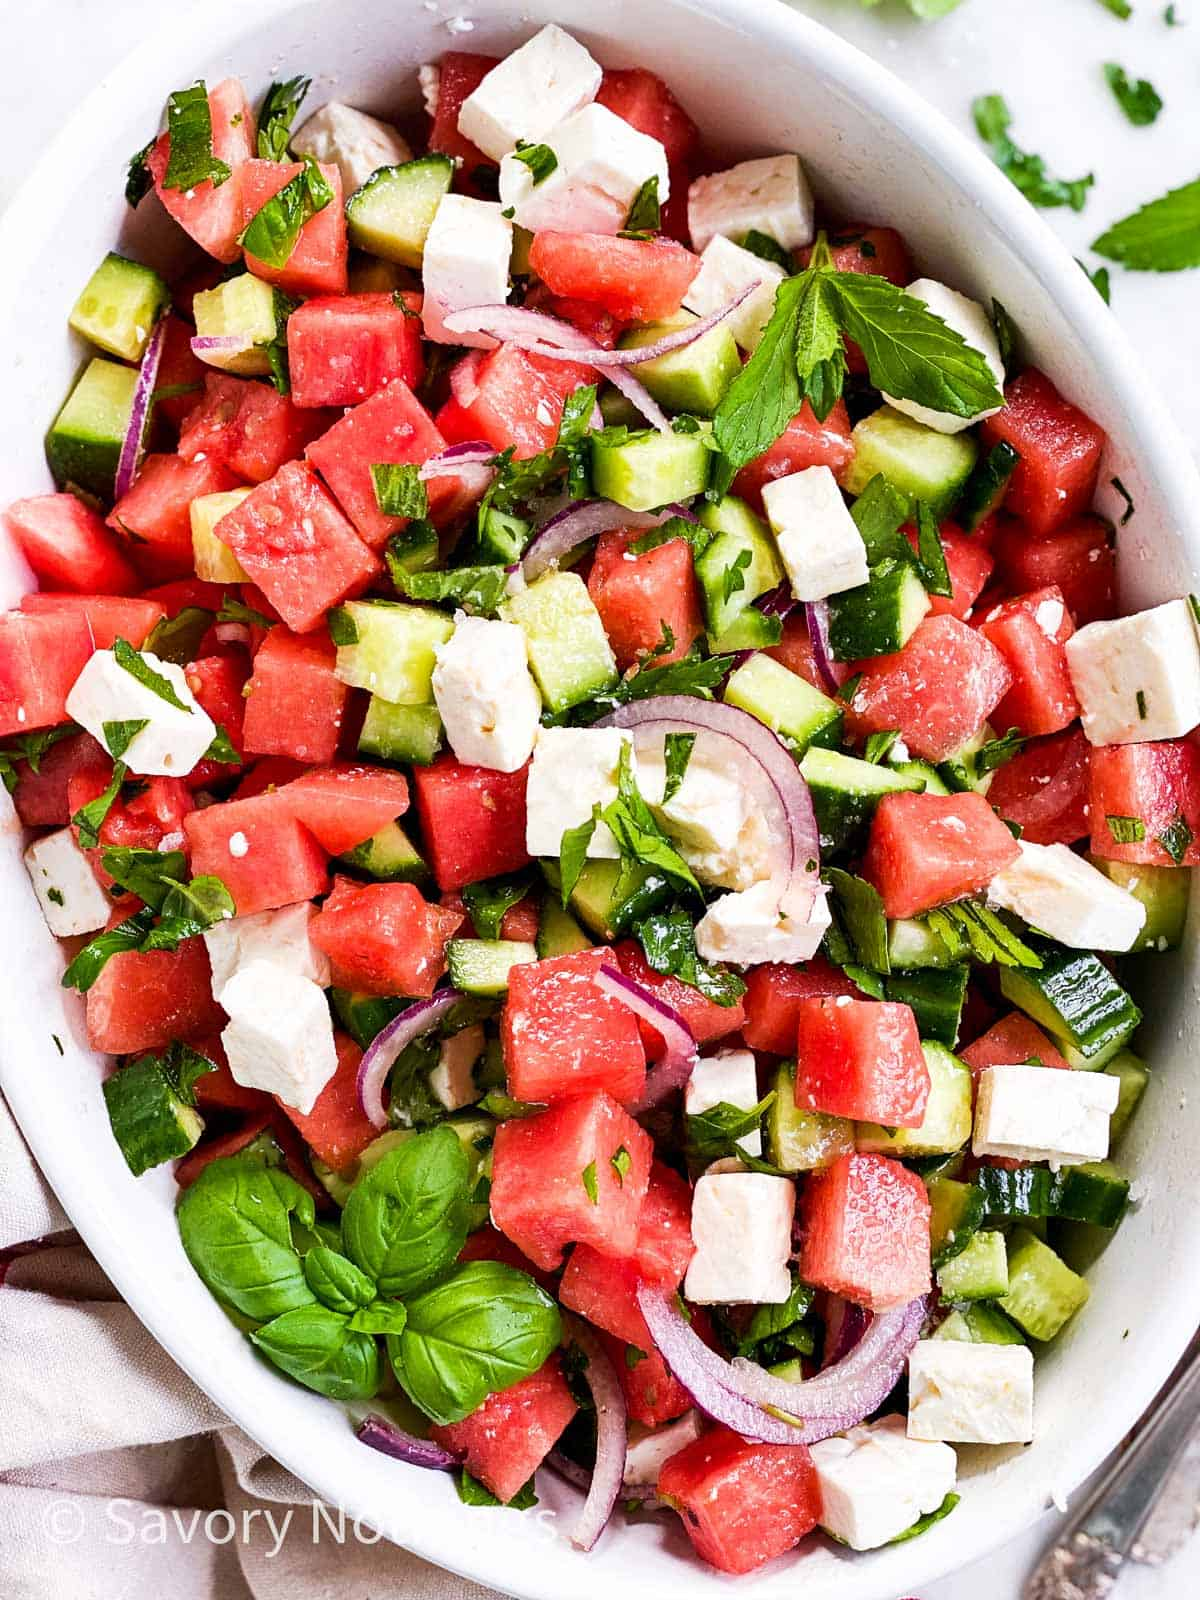 watermelon feta salad in shallow white dish